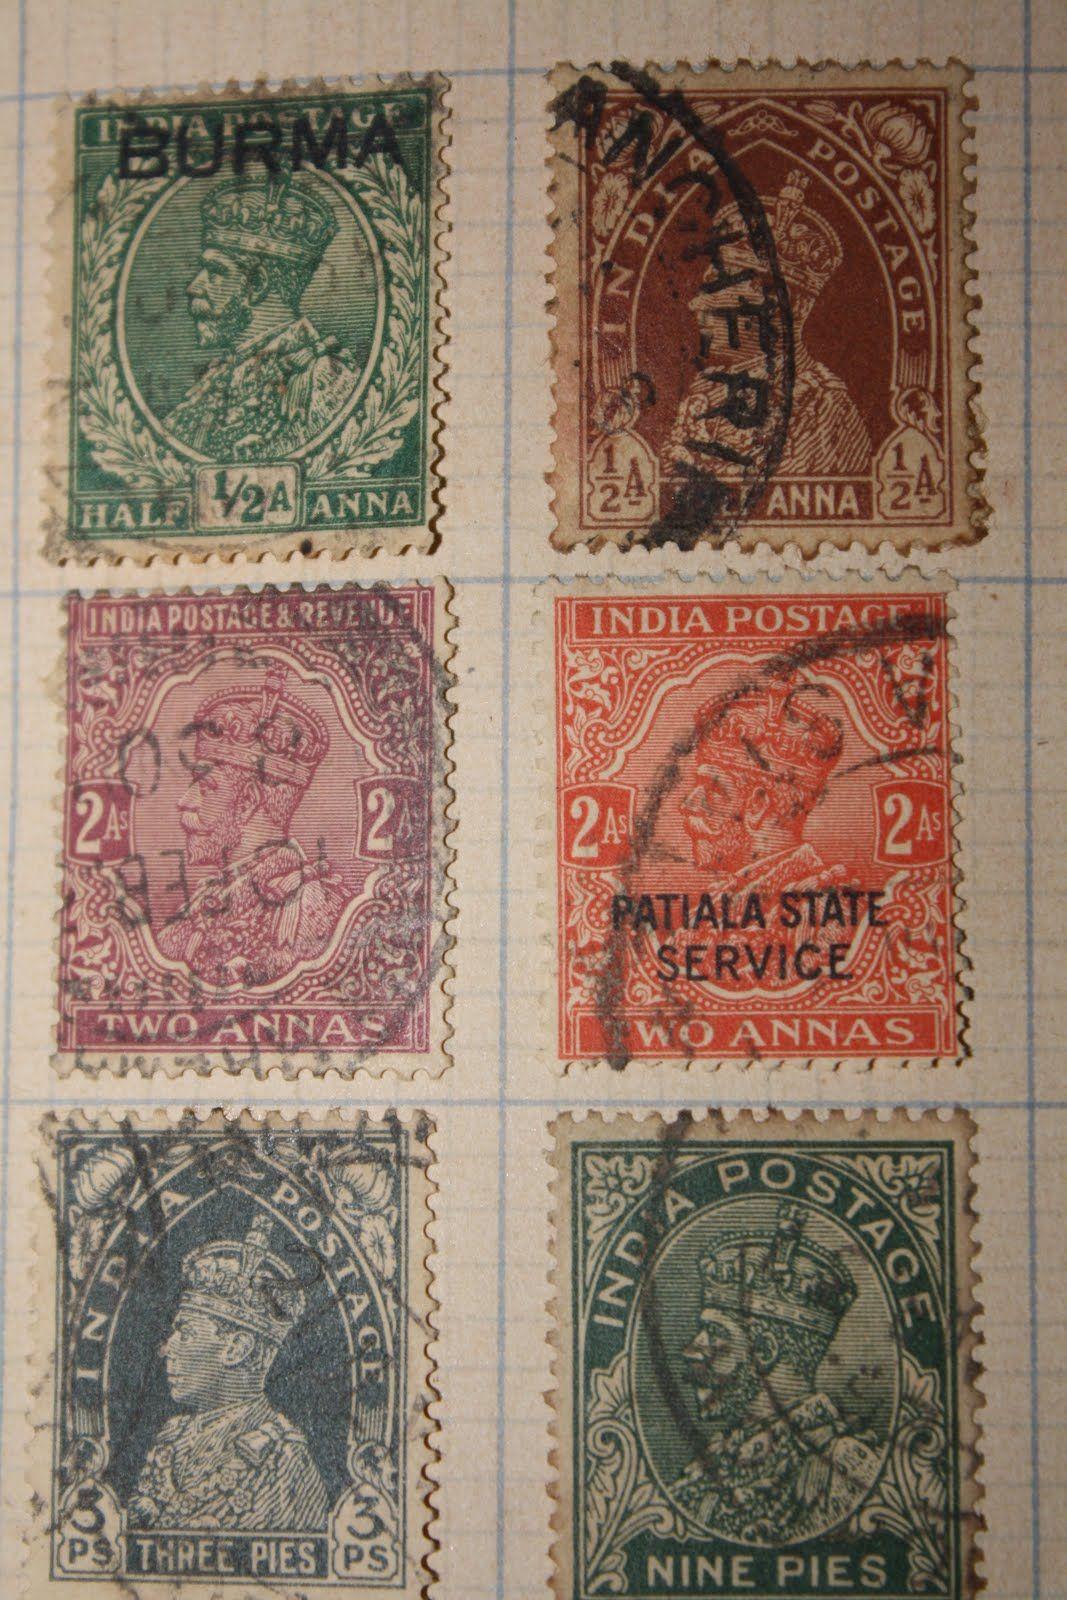 Rare Antique Postal Stamps Google Search Antique Postage